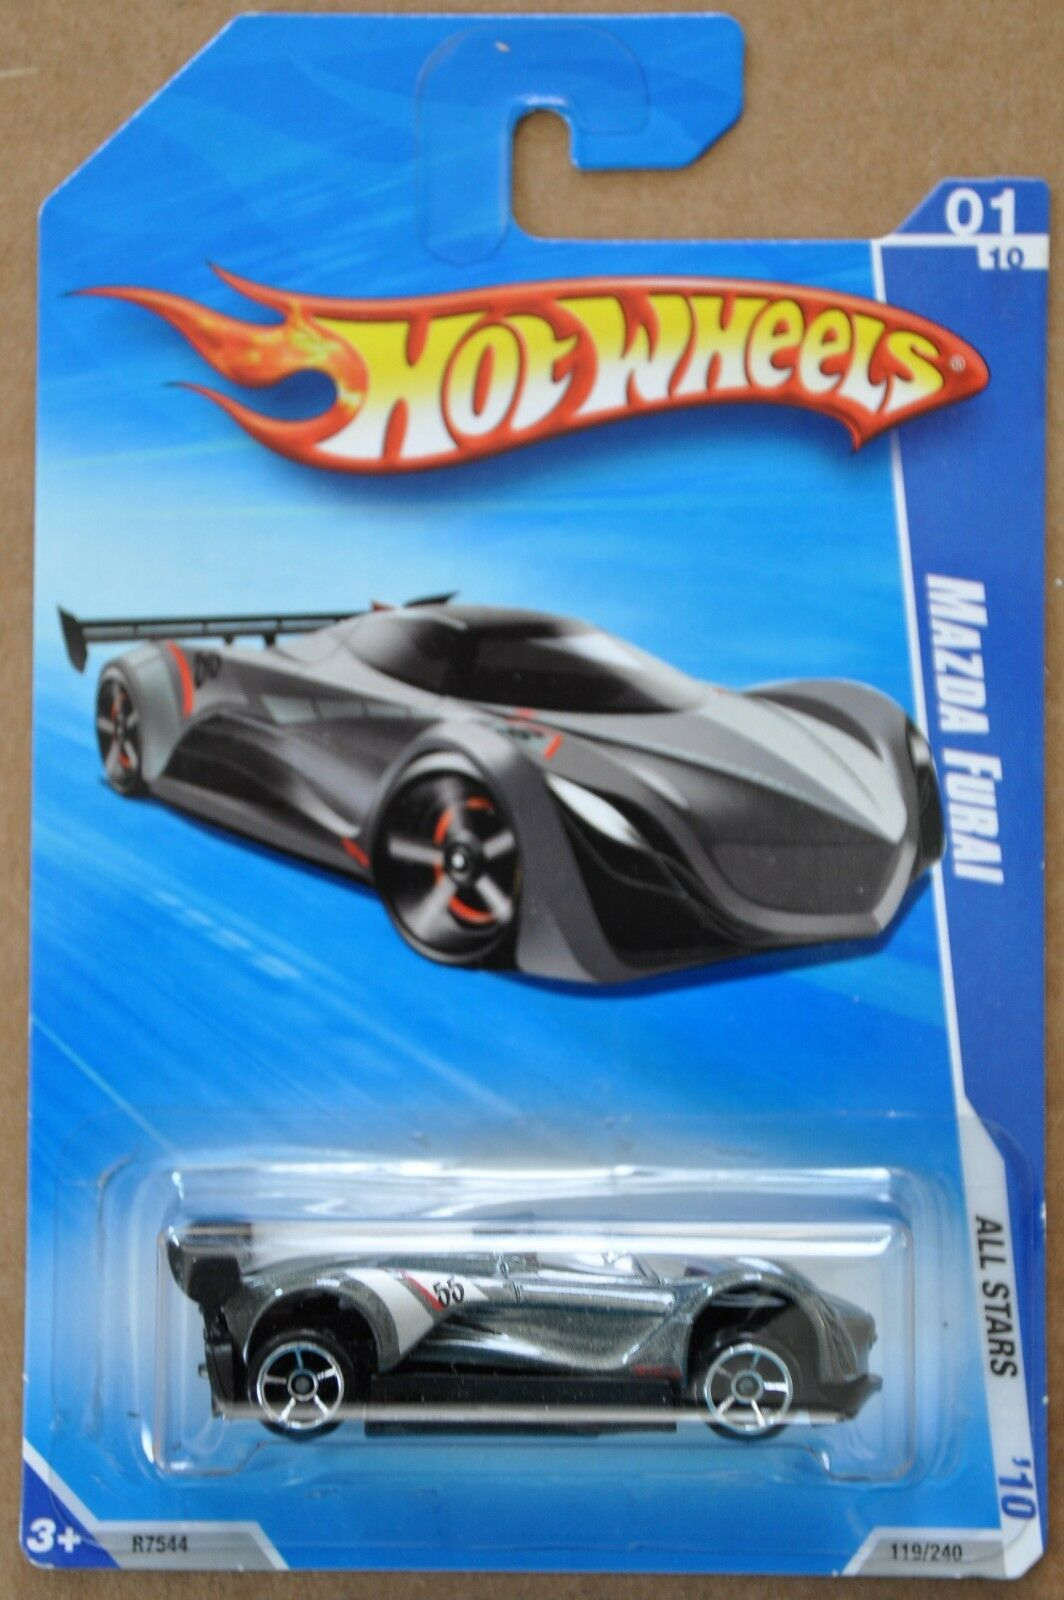 2010 Hot Wheels Mazda Furai 119 240 All Stars 1 10 ERROR MISALIGNED BASE